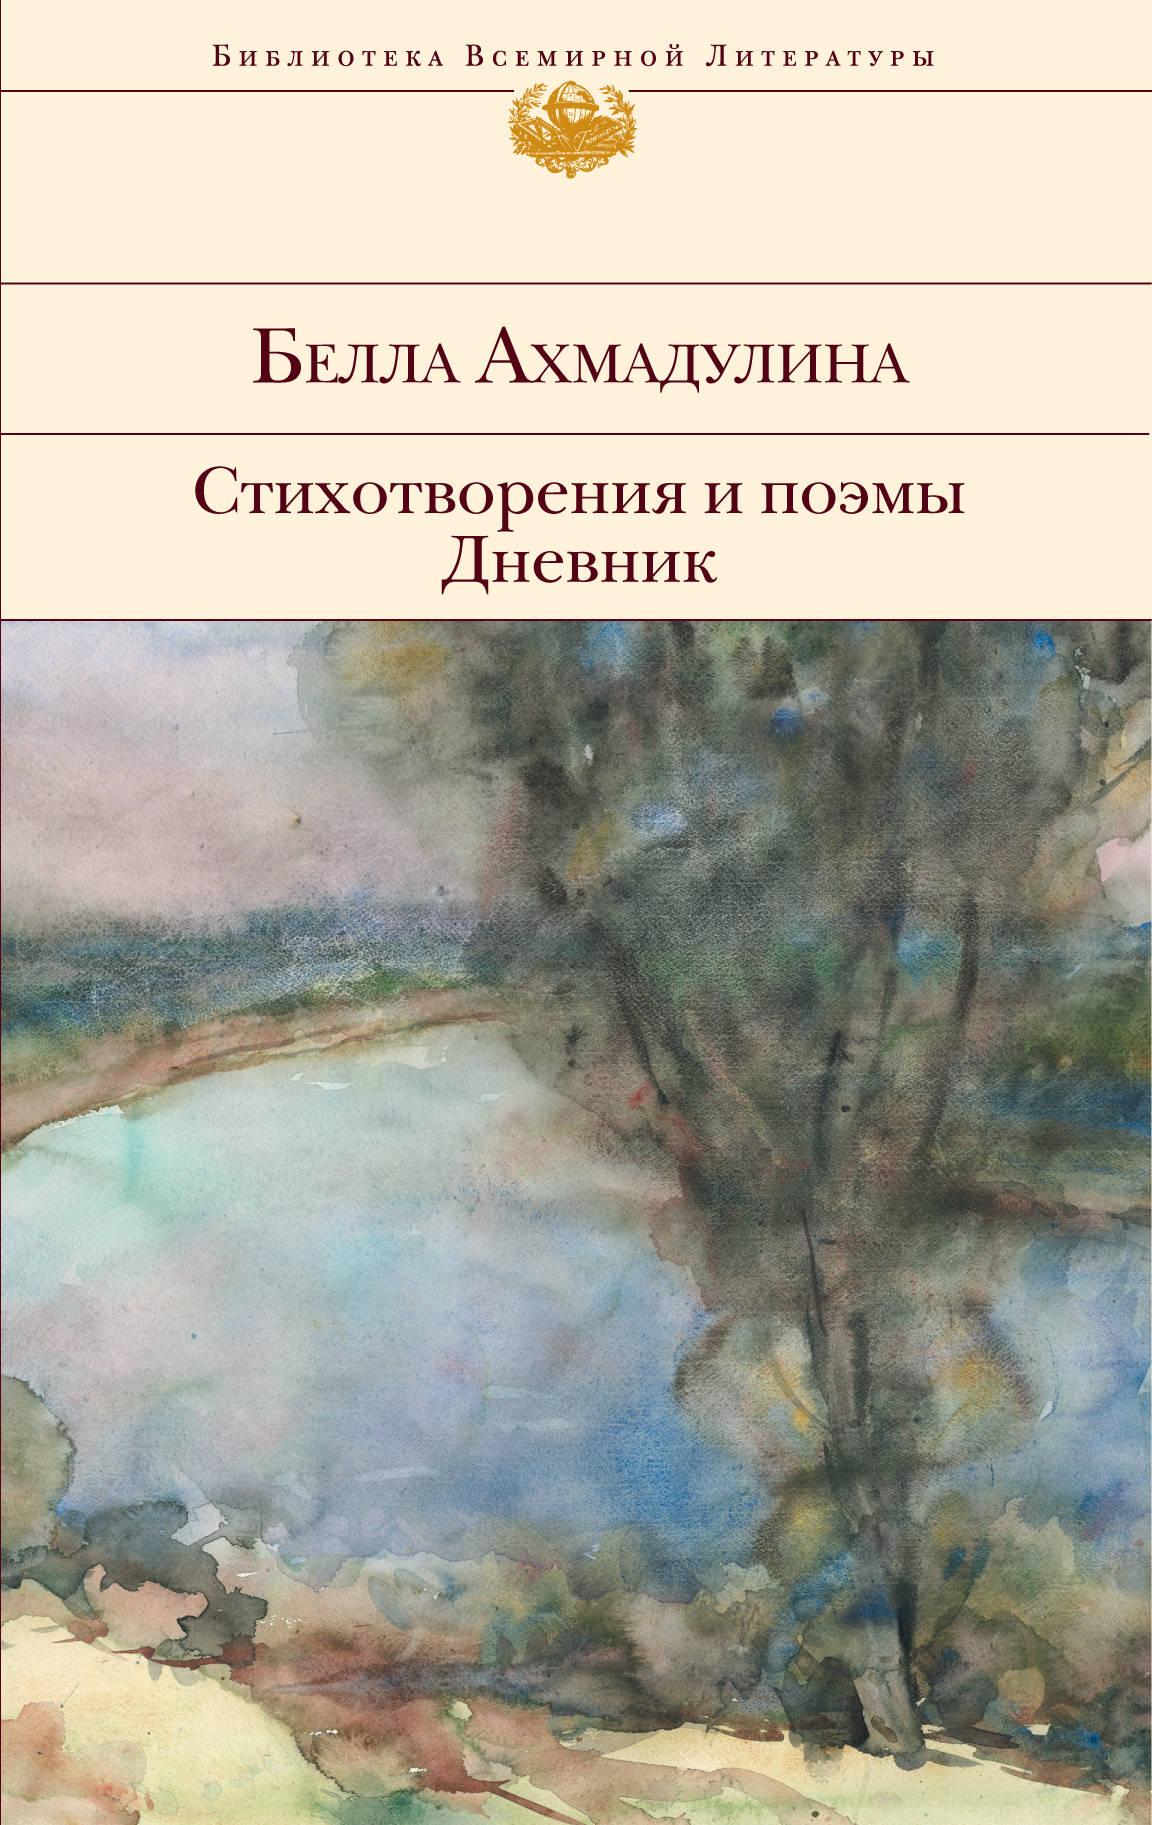 Ахмадулина Белла Ахатовна Белла Ахмадулина. Стихотворения и поэмы. Дневник